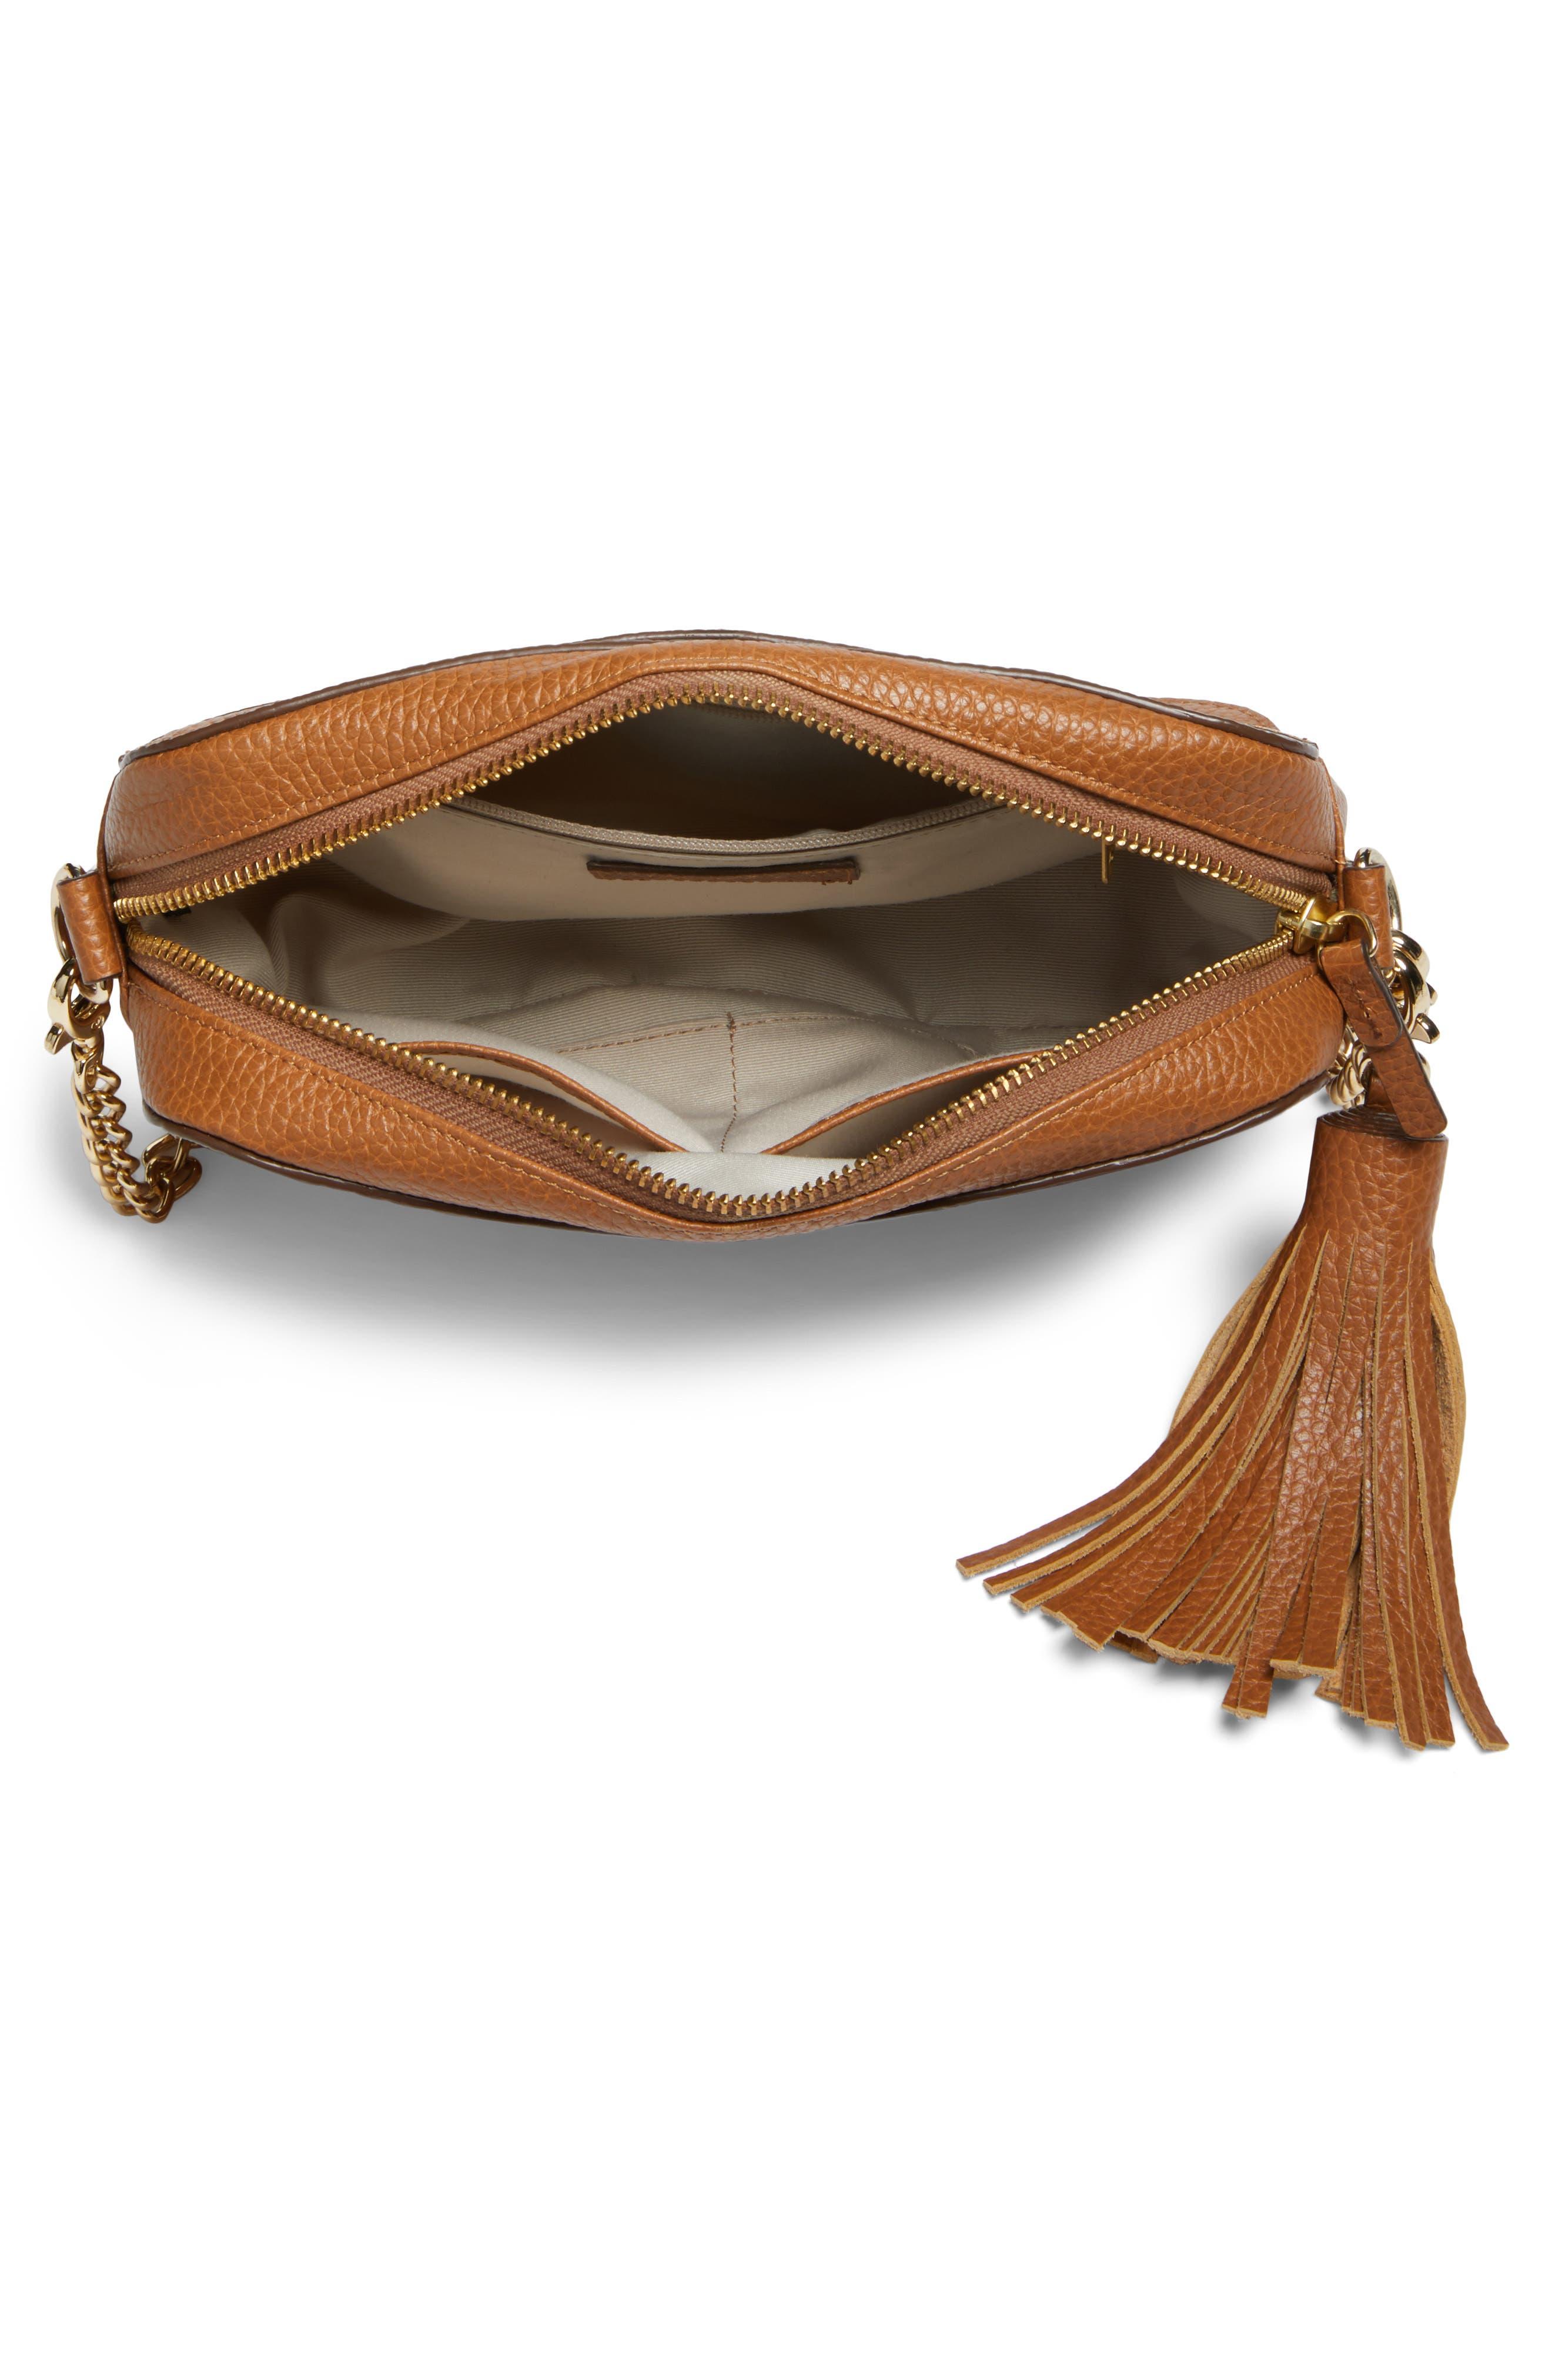 Ella Tassel Leather Crossbody Bag,                             Alternate thumbnail 4, color,                             Tan Spice